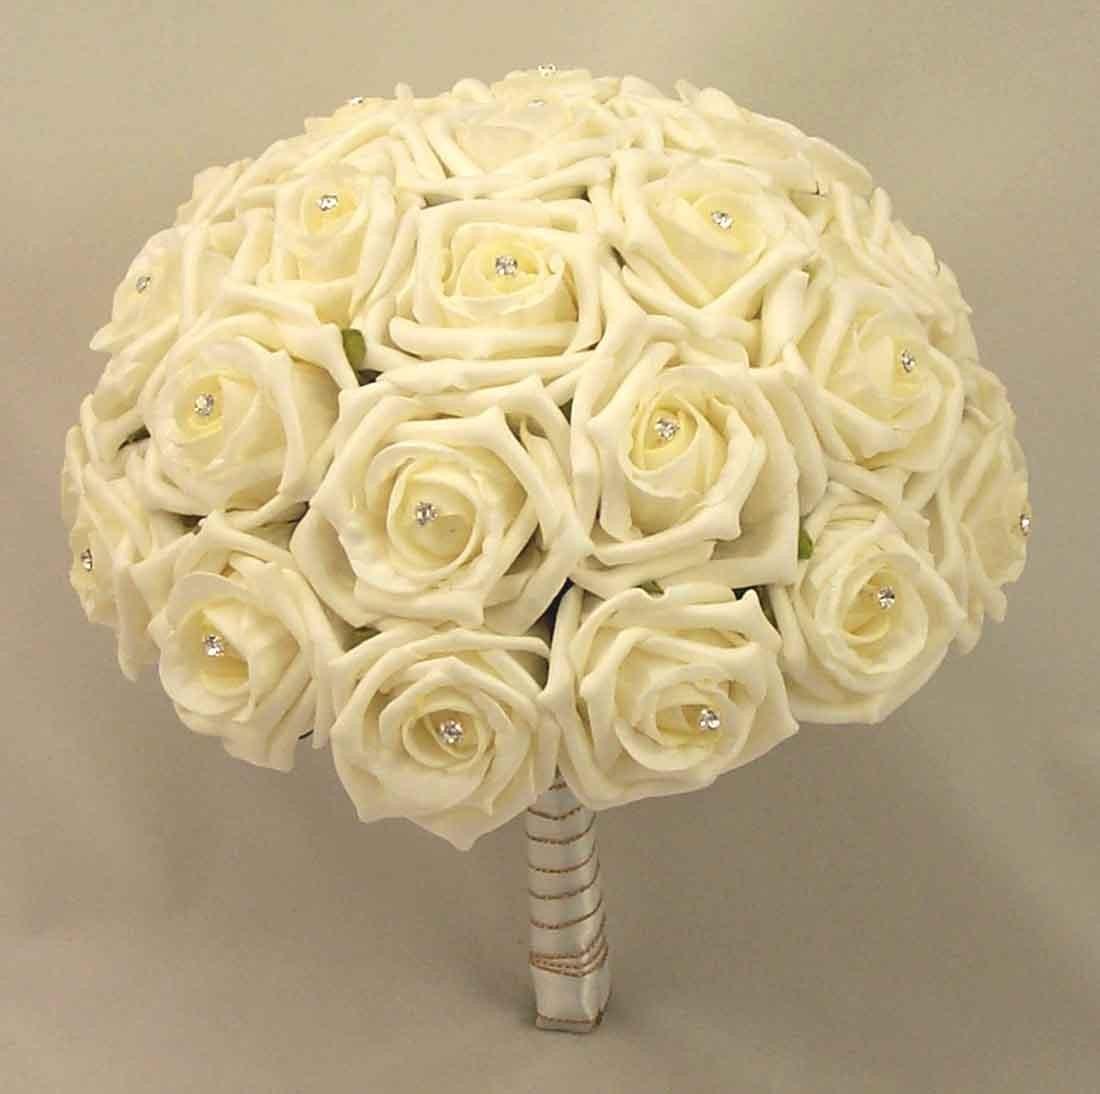 Large Ivory Diamante Rose Table Posy